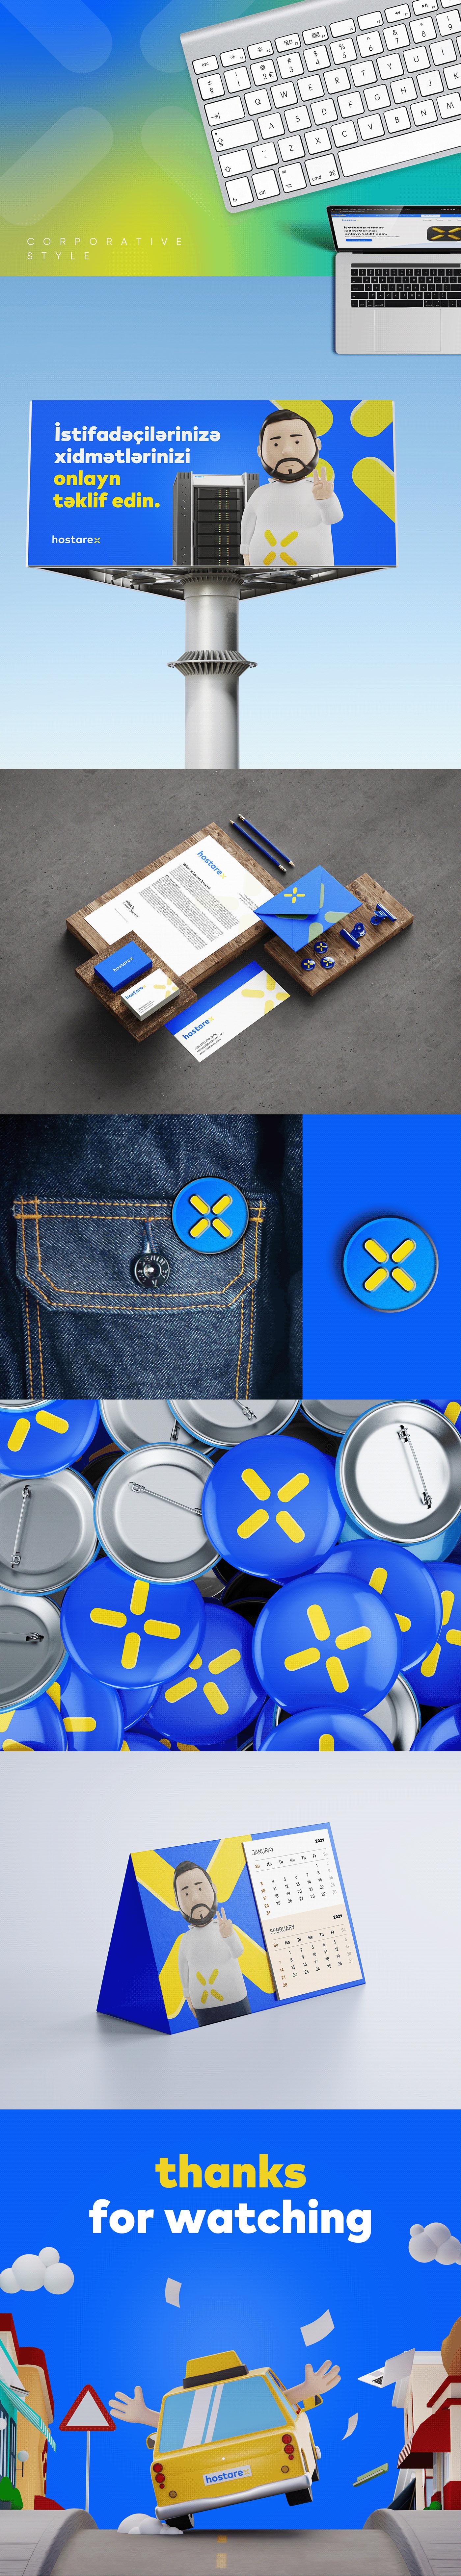 adobe illustrator baku creative projects brand branding  corporative design design graphic hostarex logo X logo